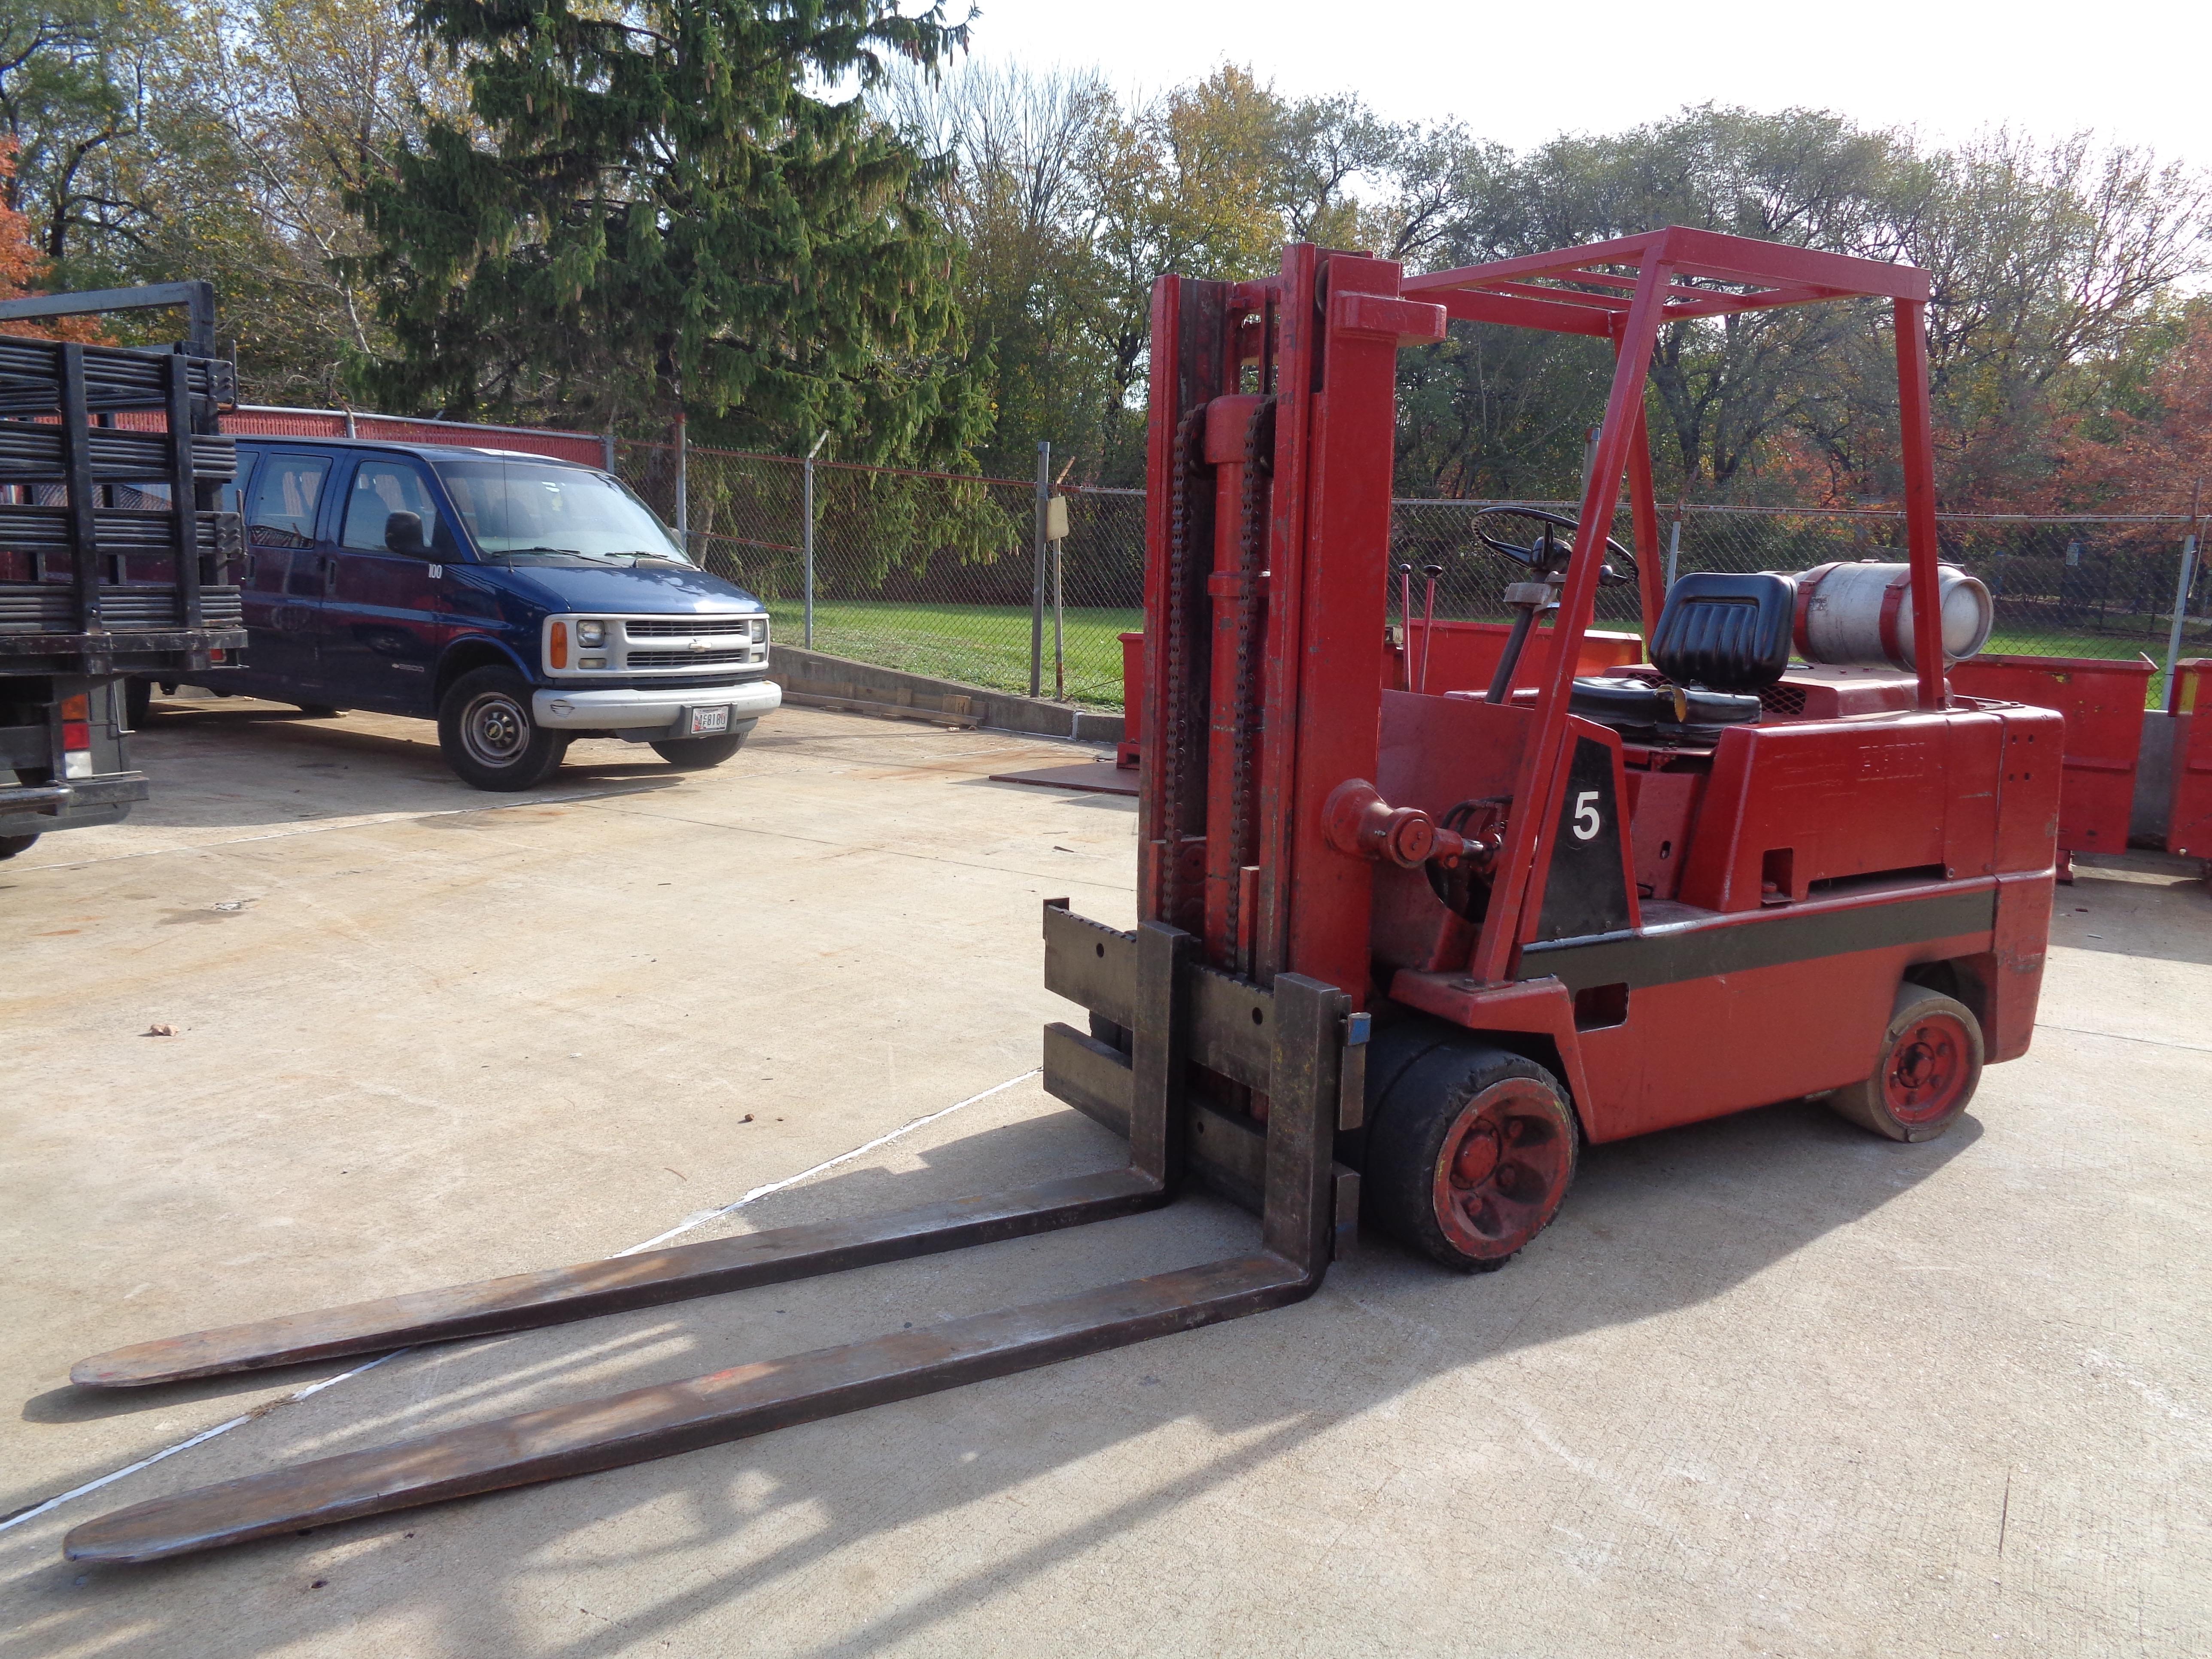 Clark C120-35 Forklift - 12,000 lbs - Image 2 of 6